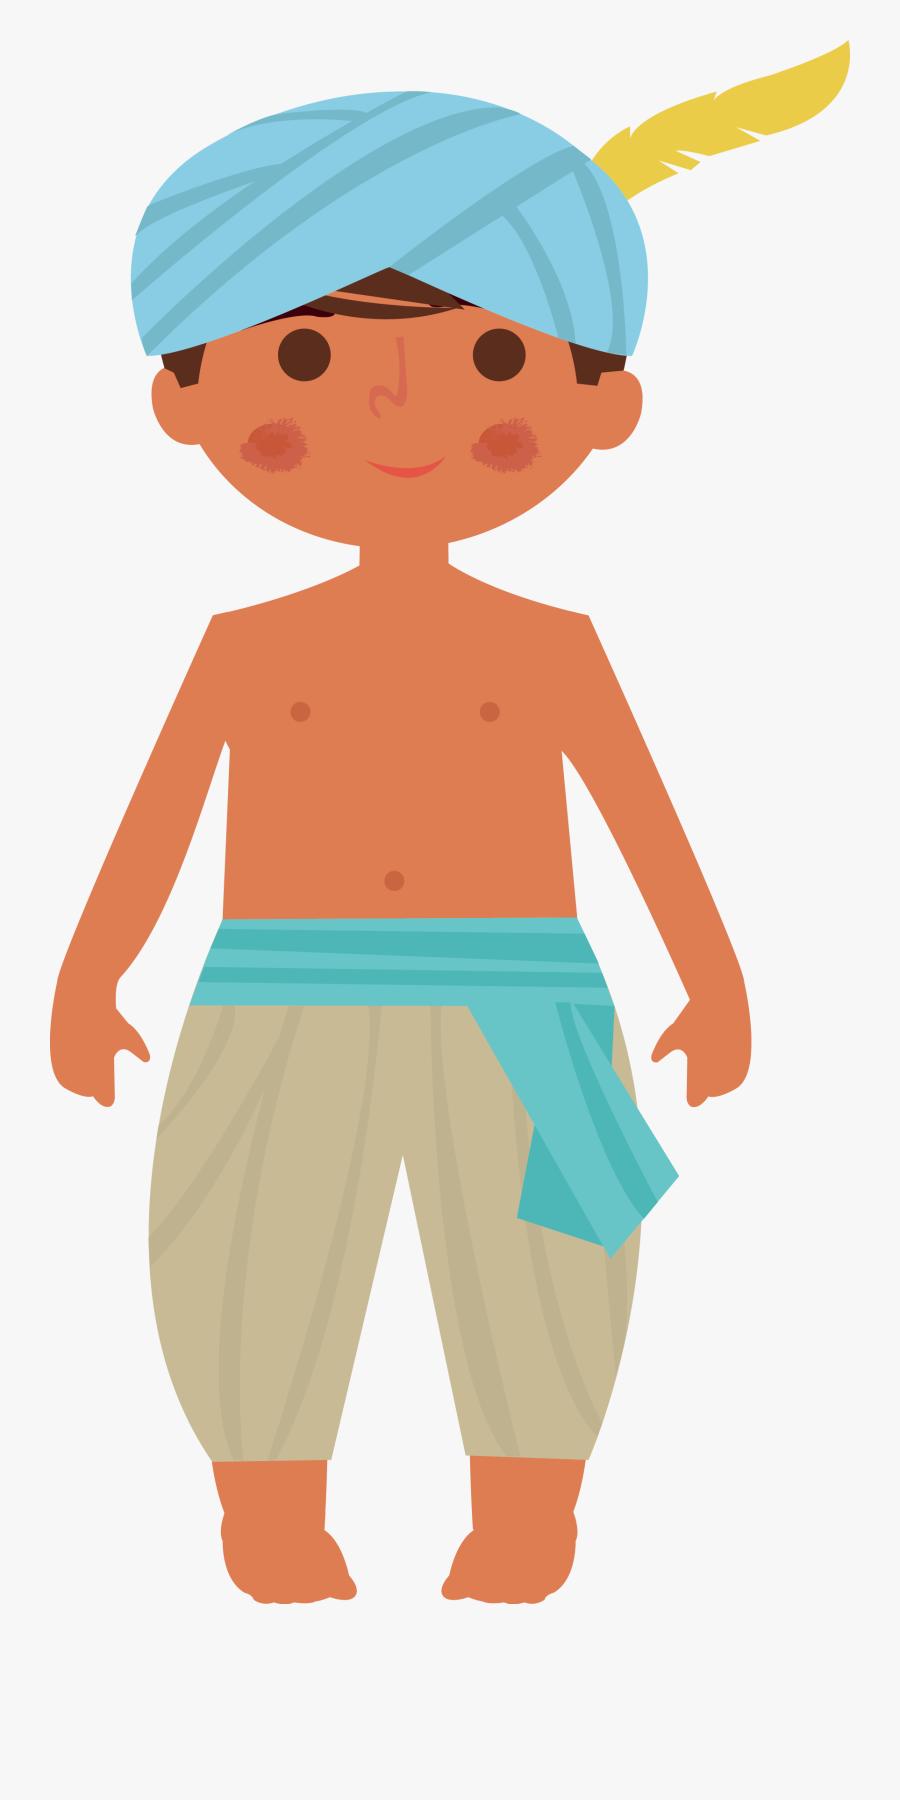 India Boy Illustration - Illustration, Transparent Clipart